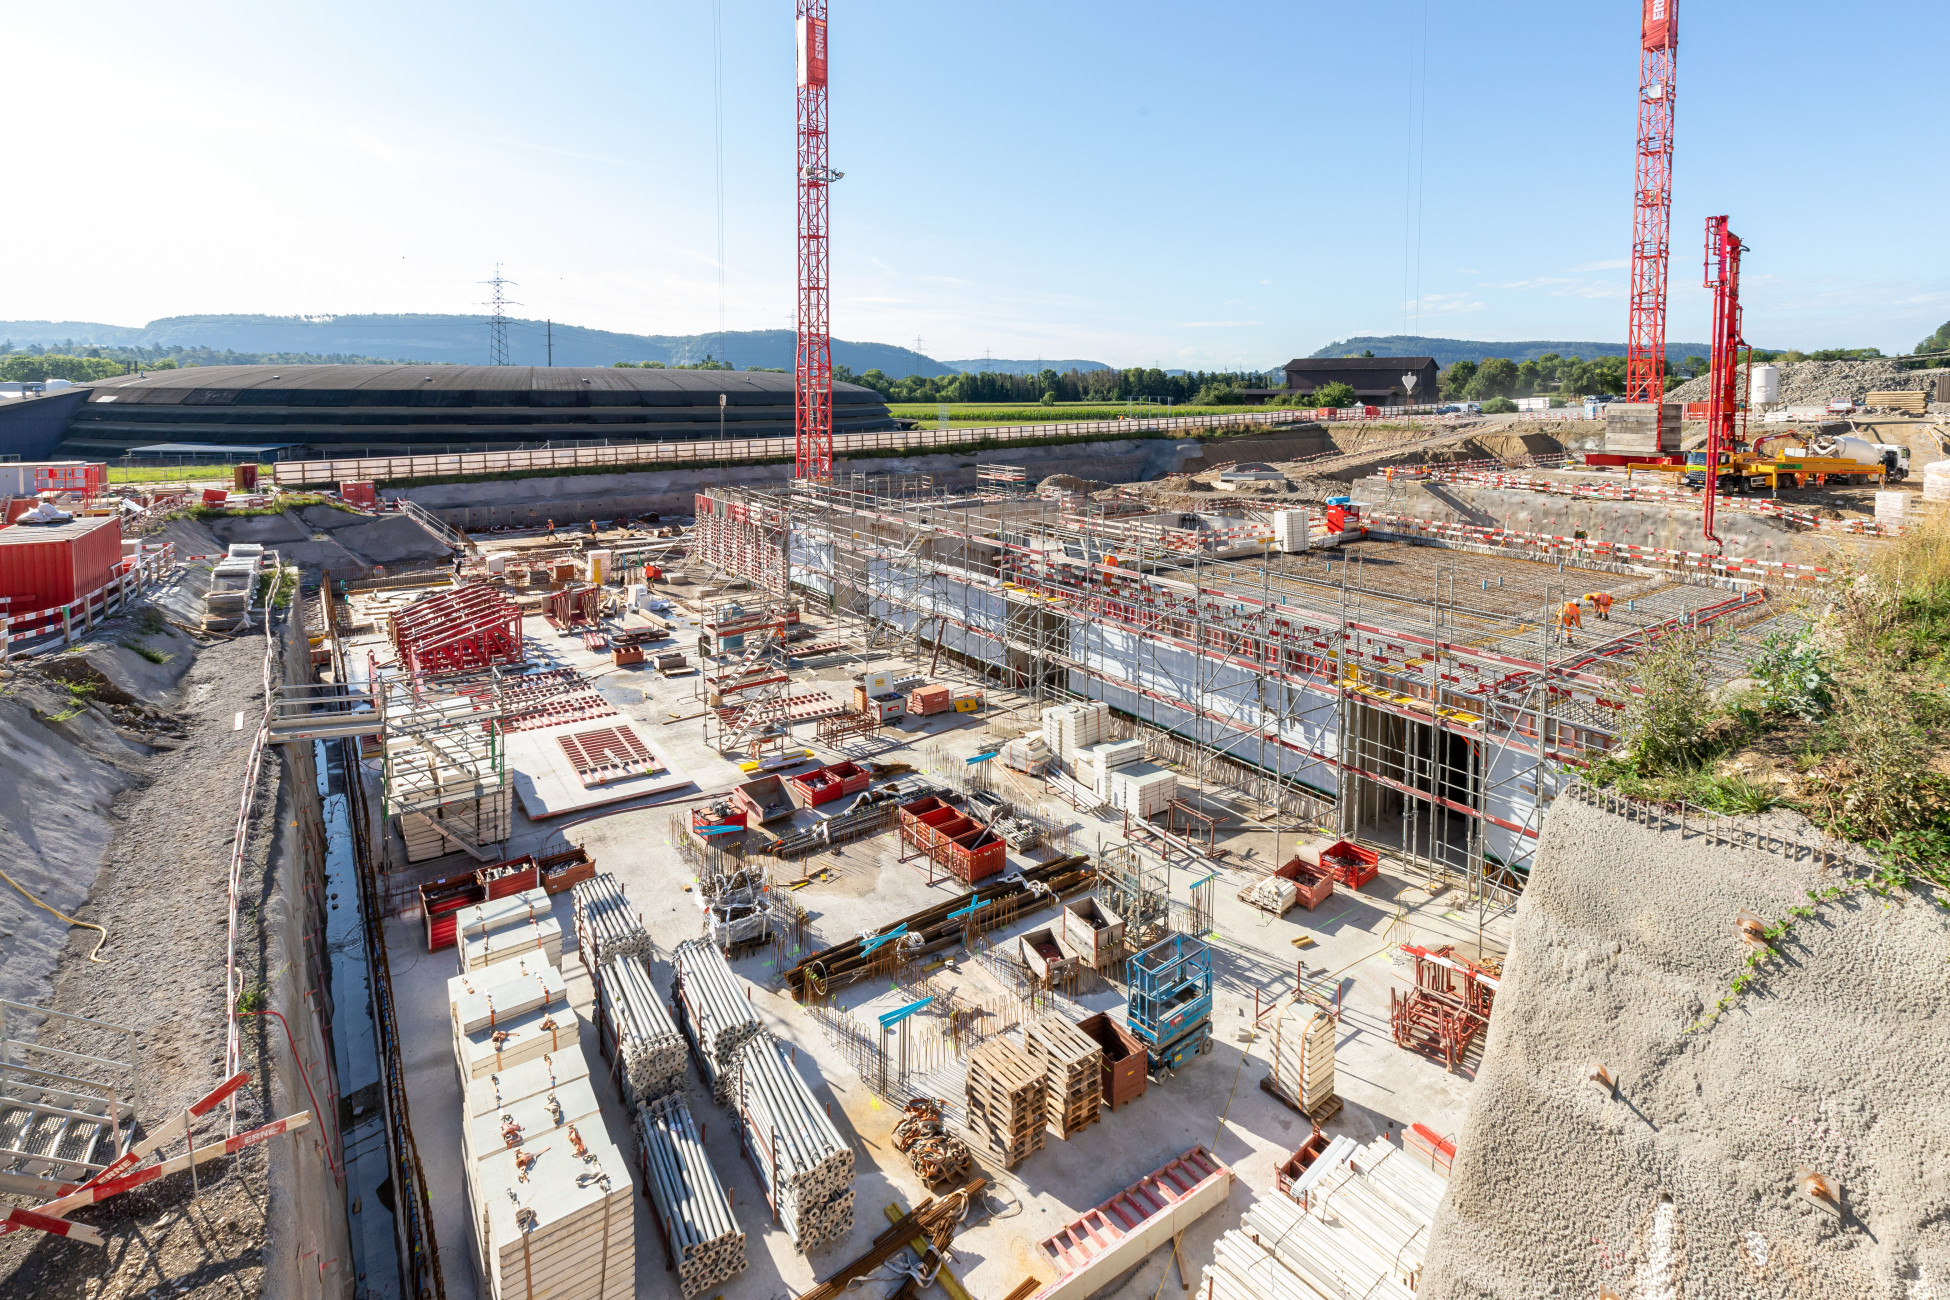 Infrastrukturbau Baustelle Park Innovaare